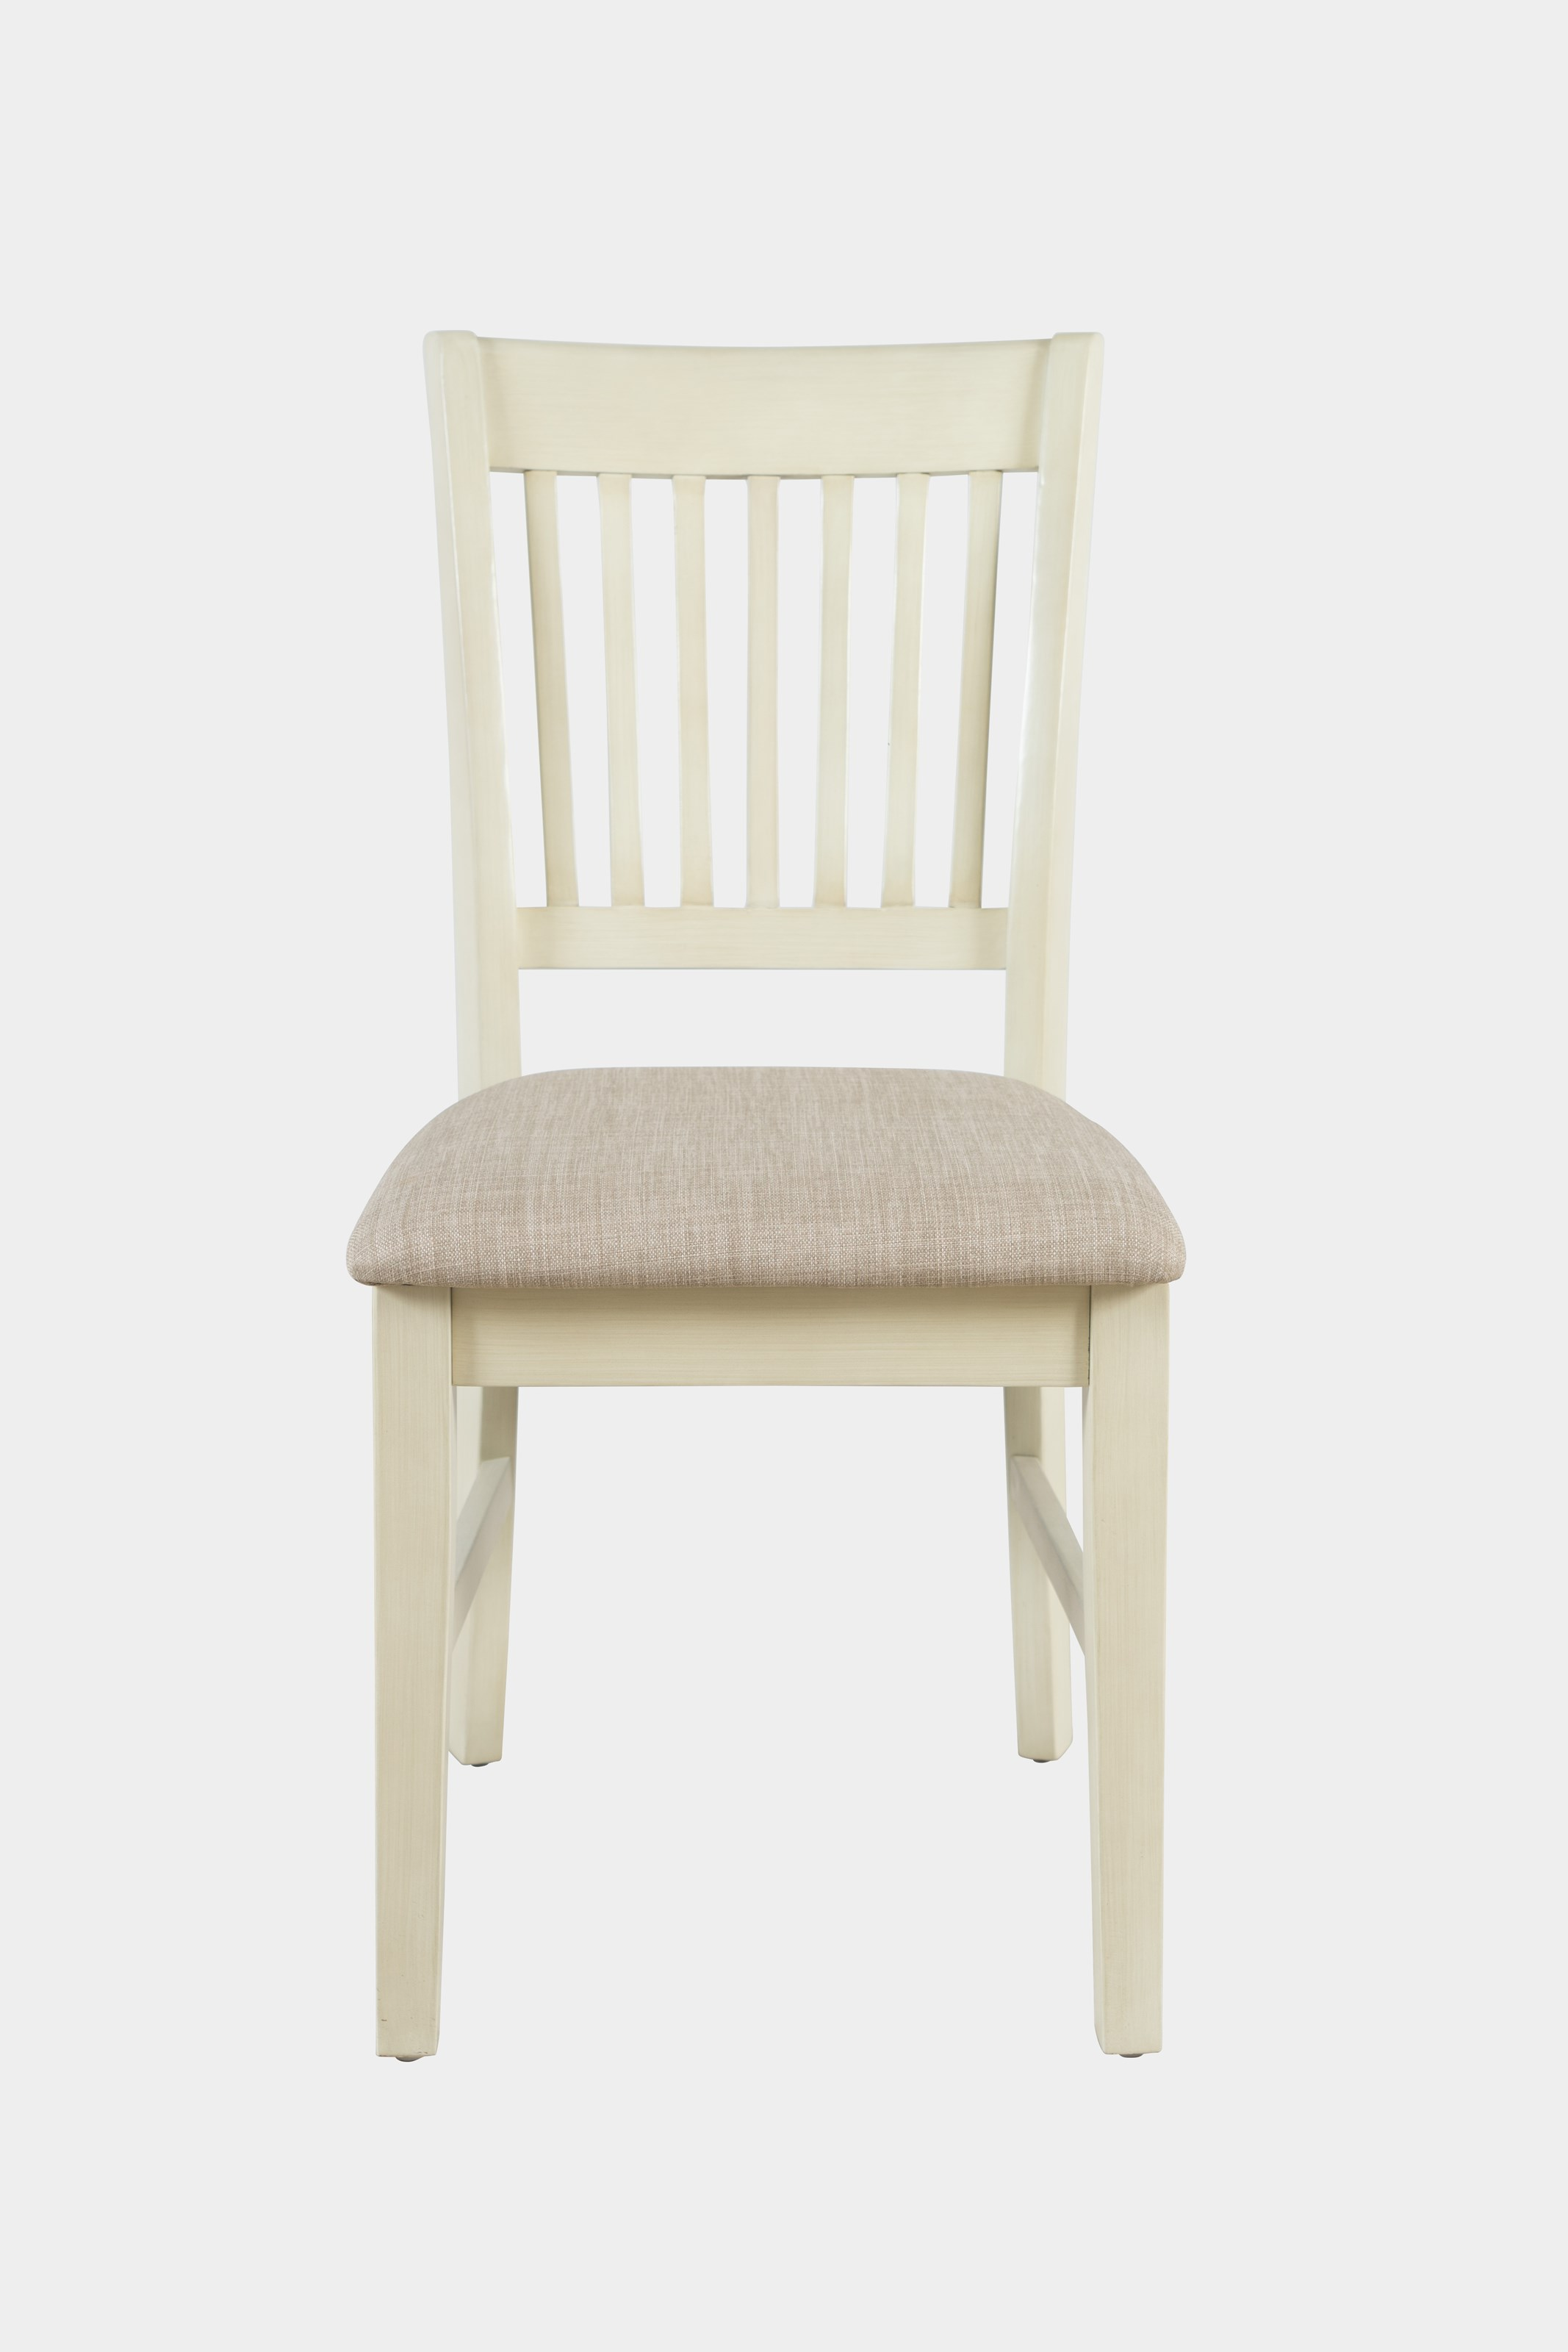 Craftsman Desk Chair by Jofran at Jofran